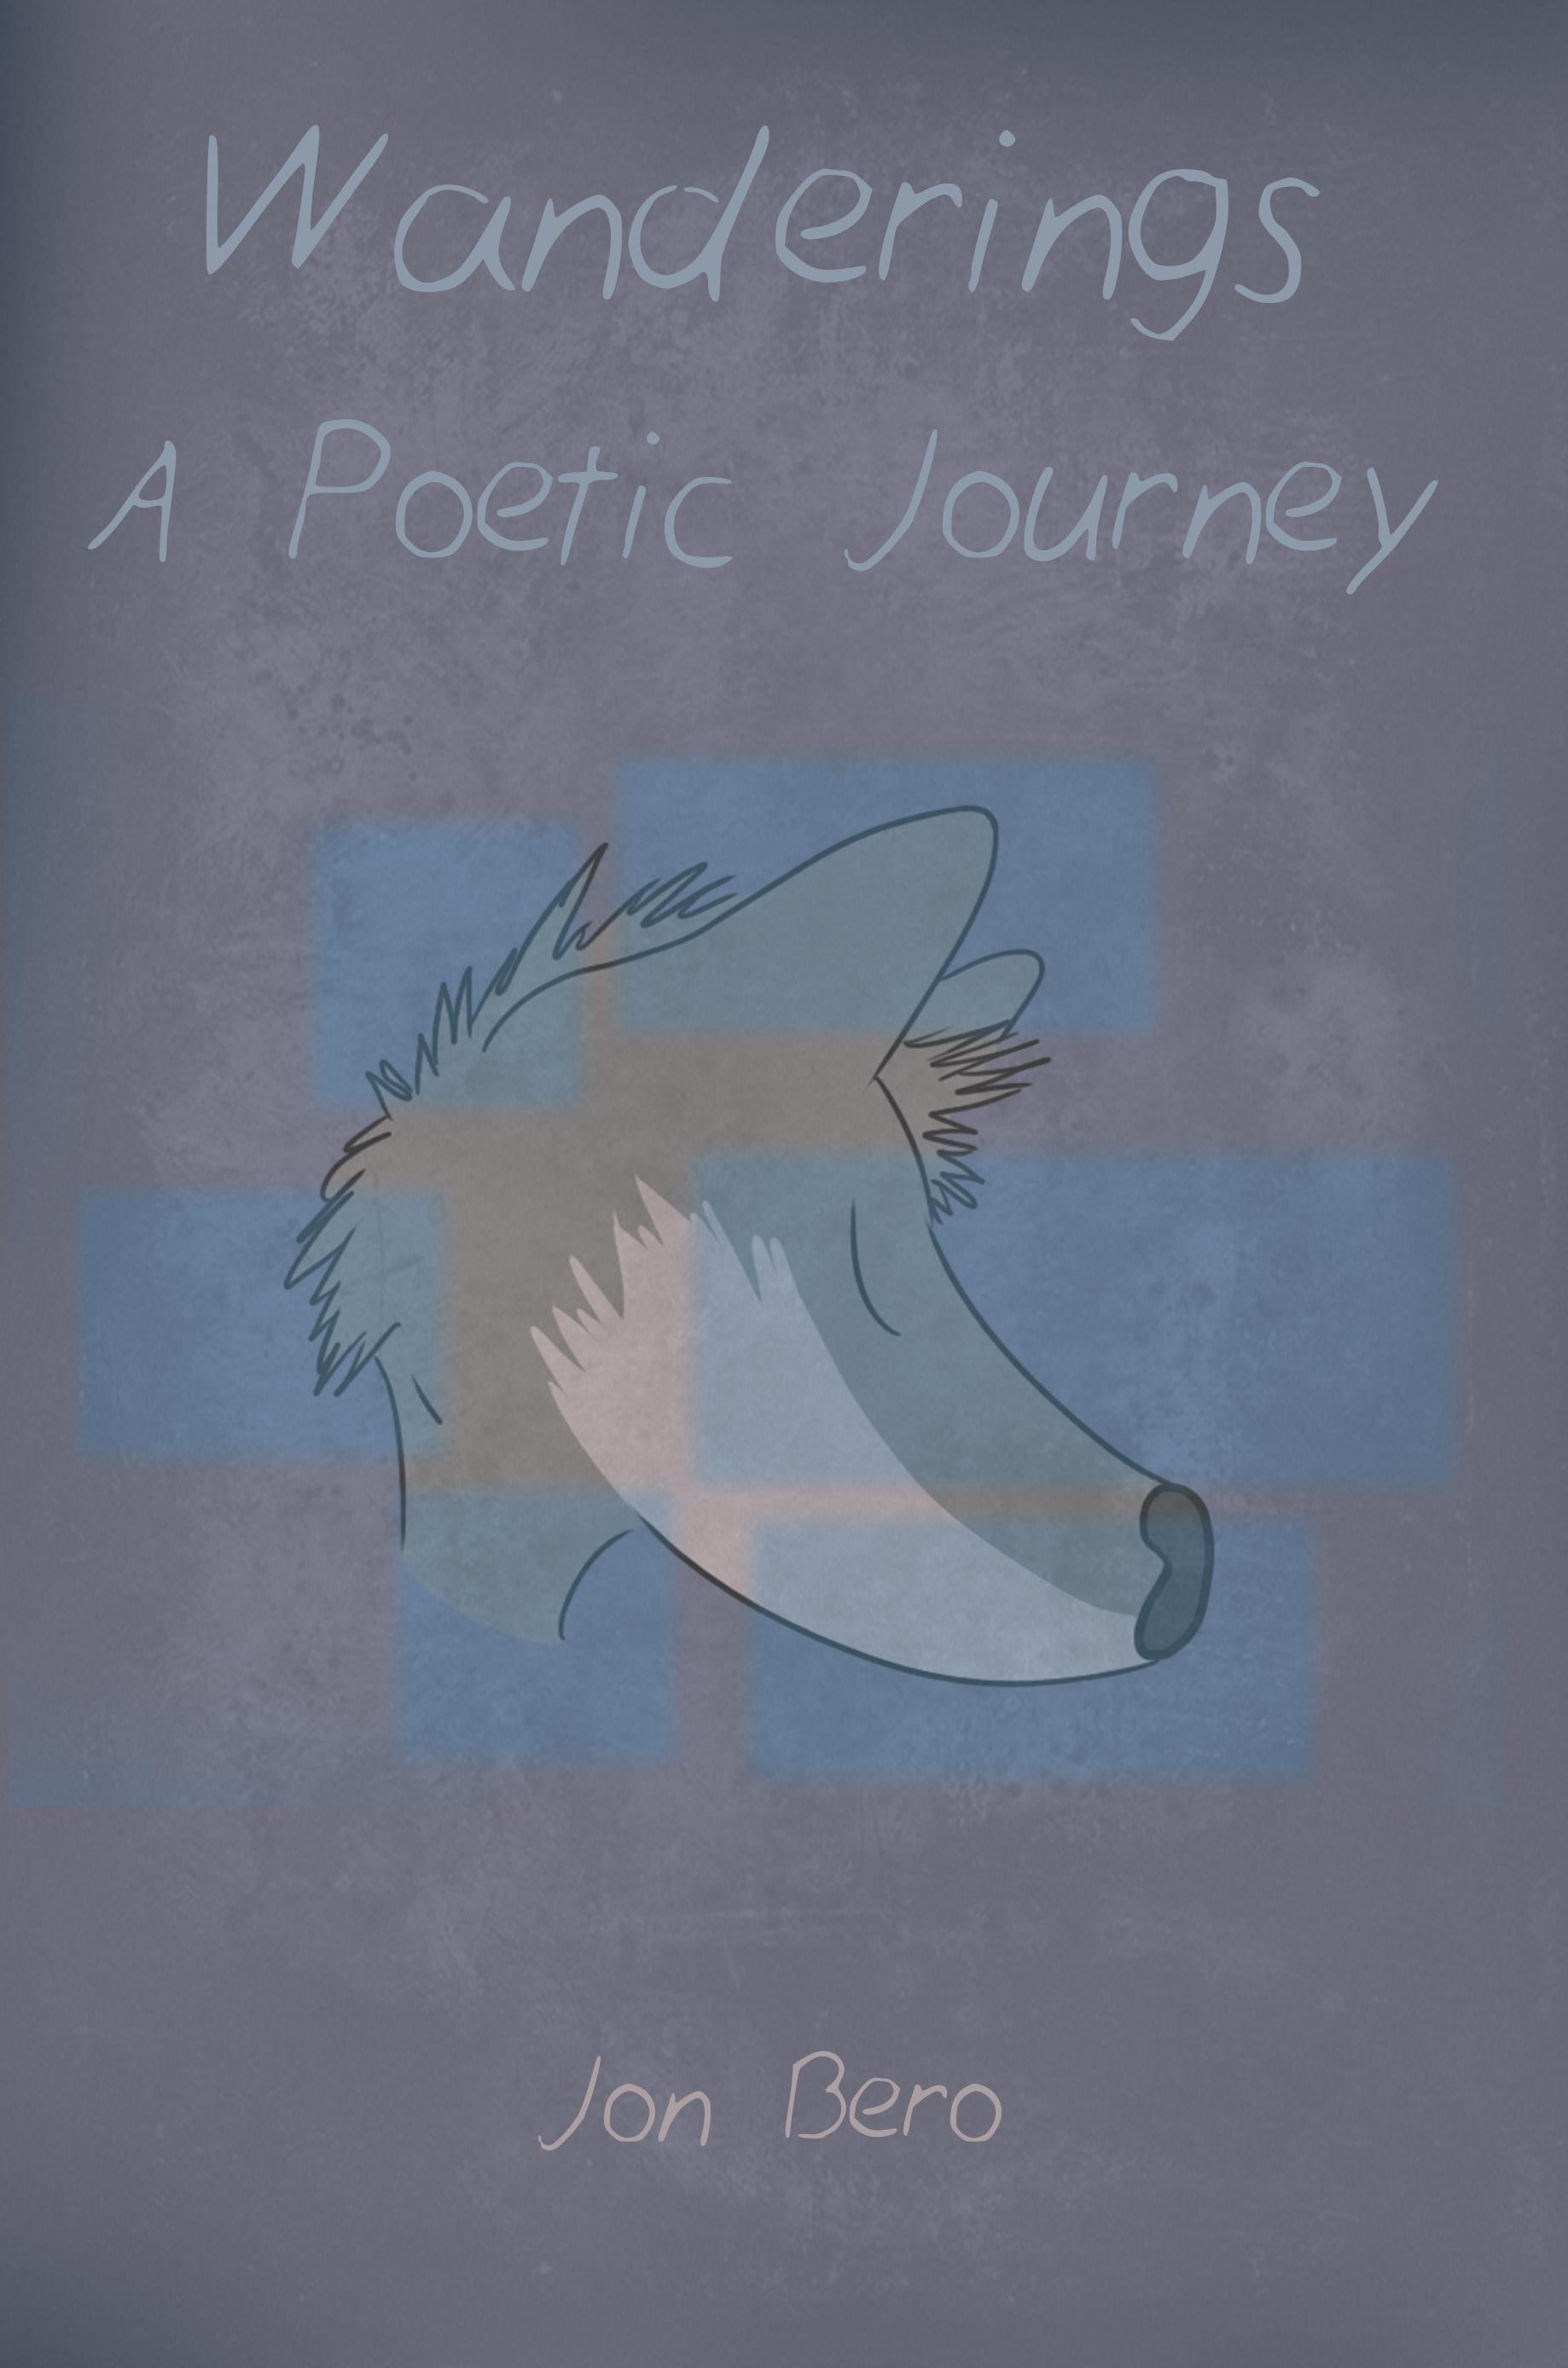 Wanderings: A Poetic Journey